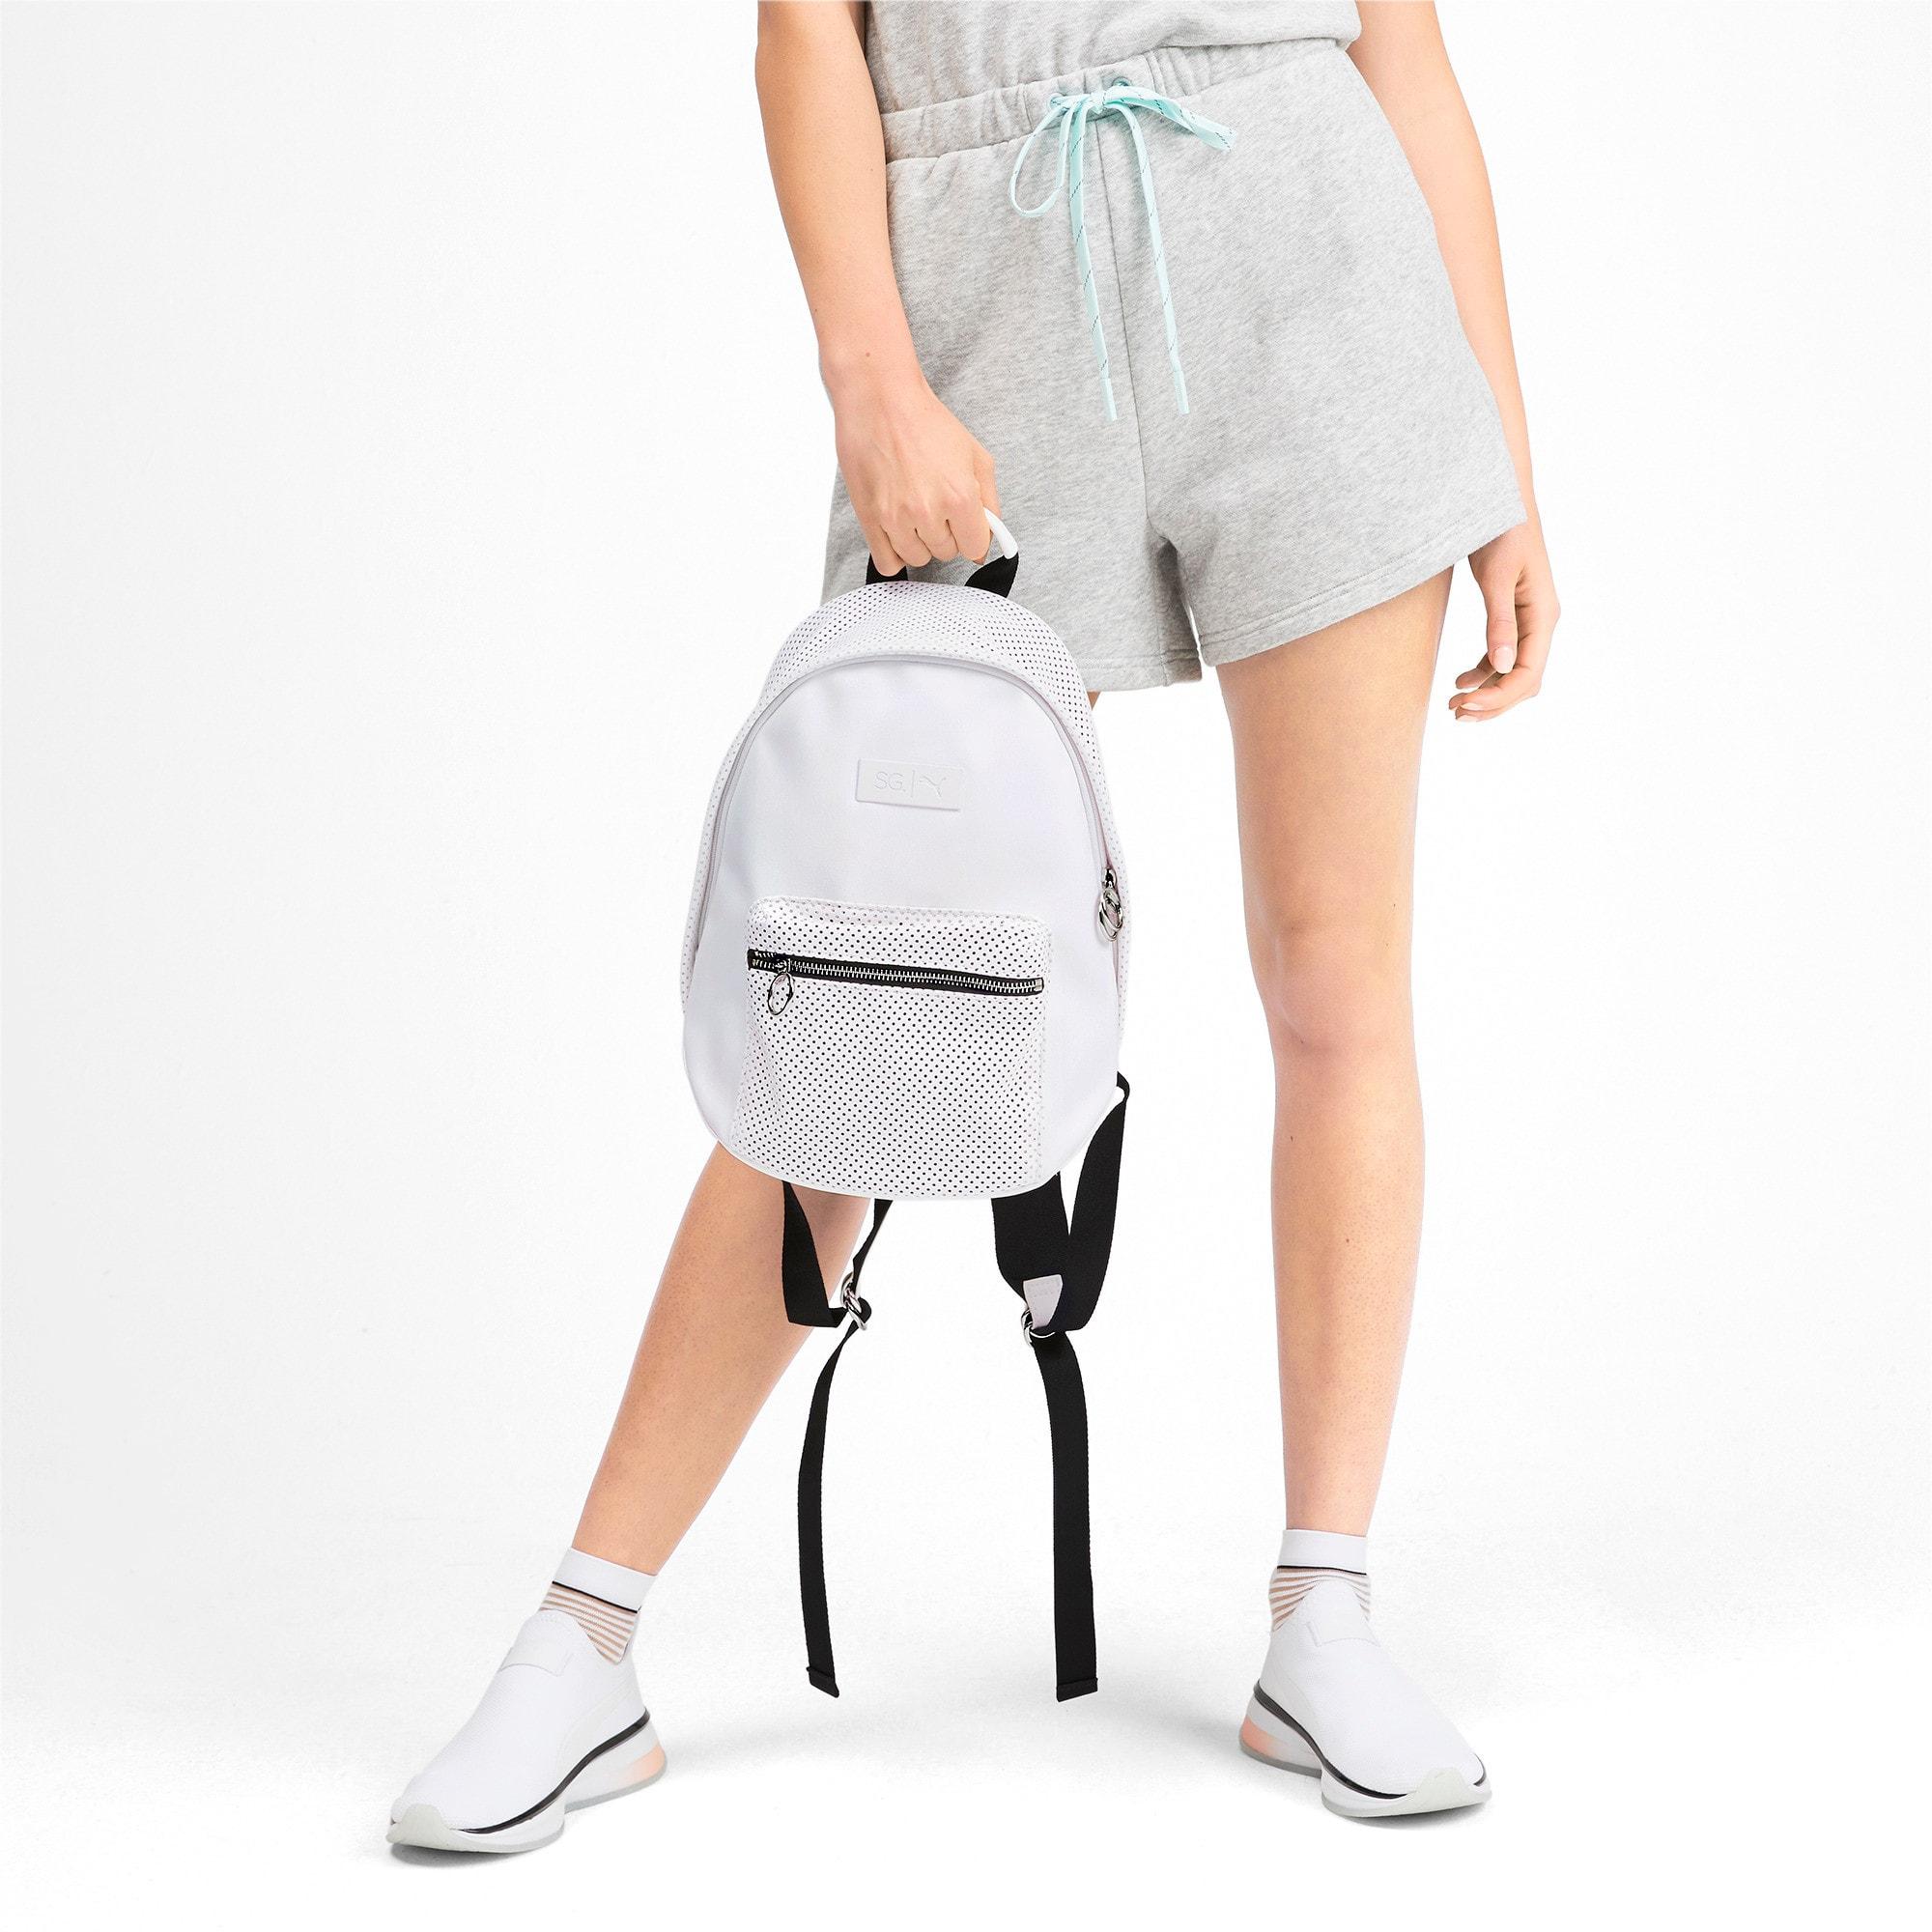 Thumbnail 2 of PUMA x SELENA GOMEZ Style Women's Backpack, Puma White, medium